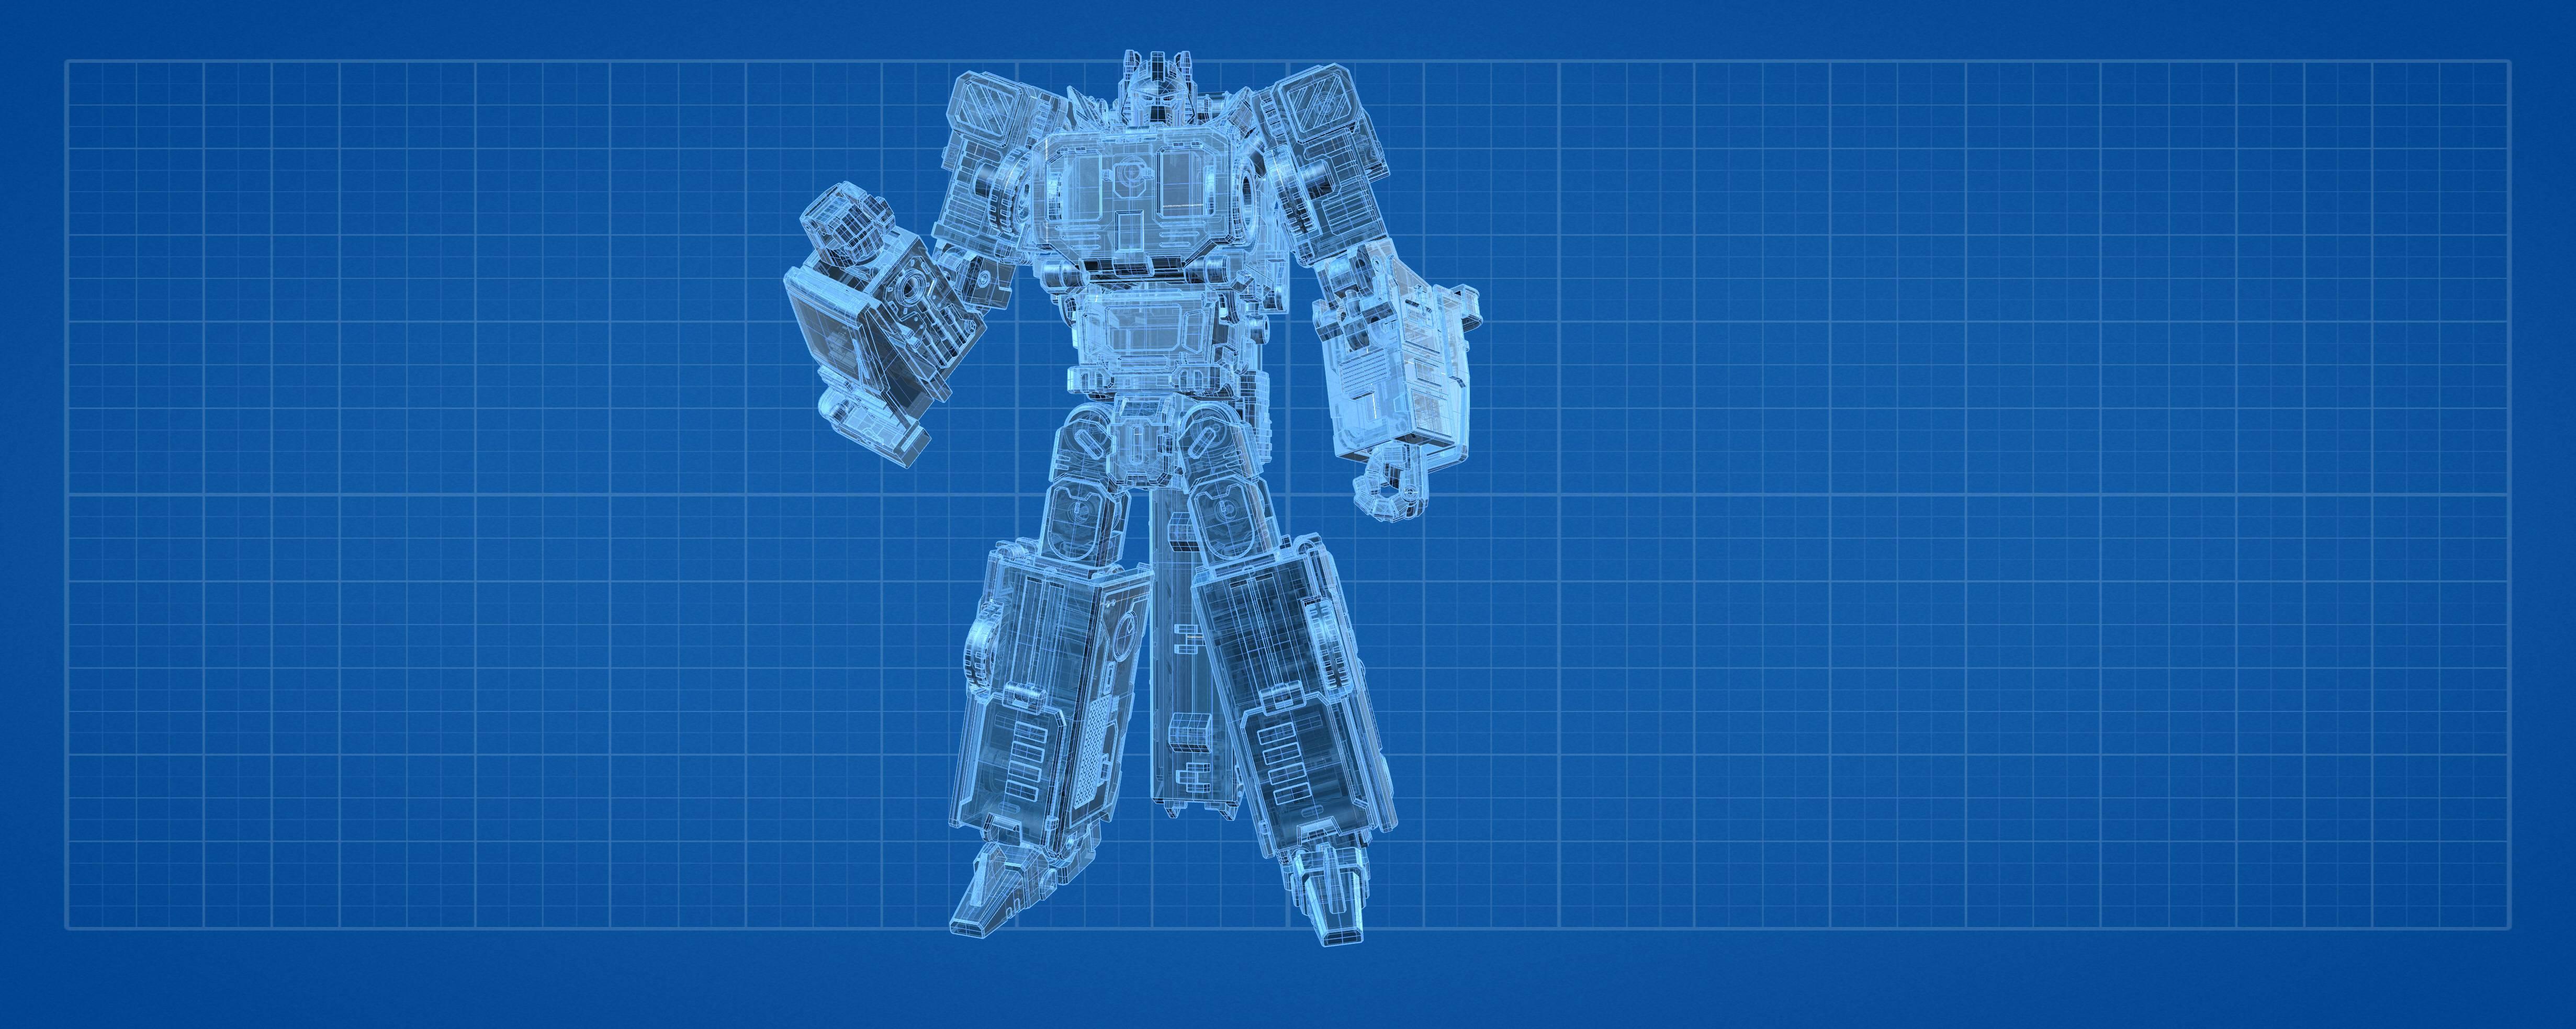 [Ocular Max] Produit Tiers - Maximus Pro - aka Defensor/Défenso Nl7rfreo